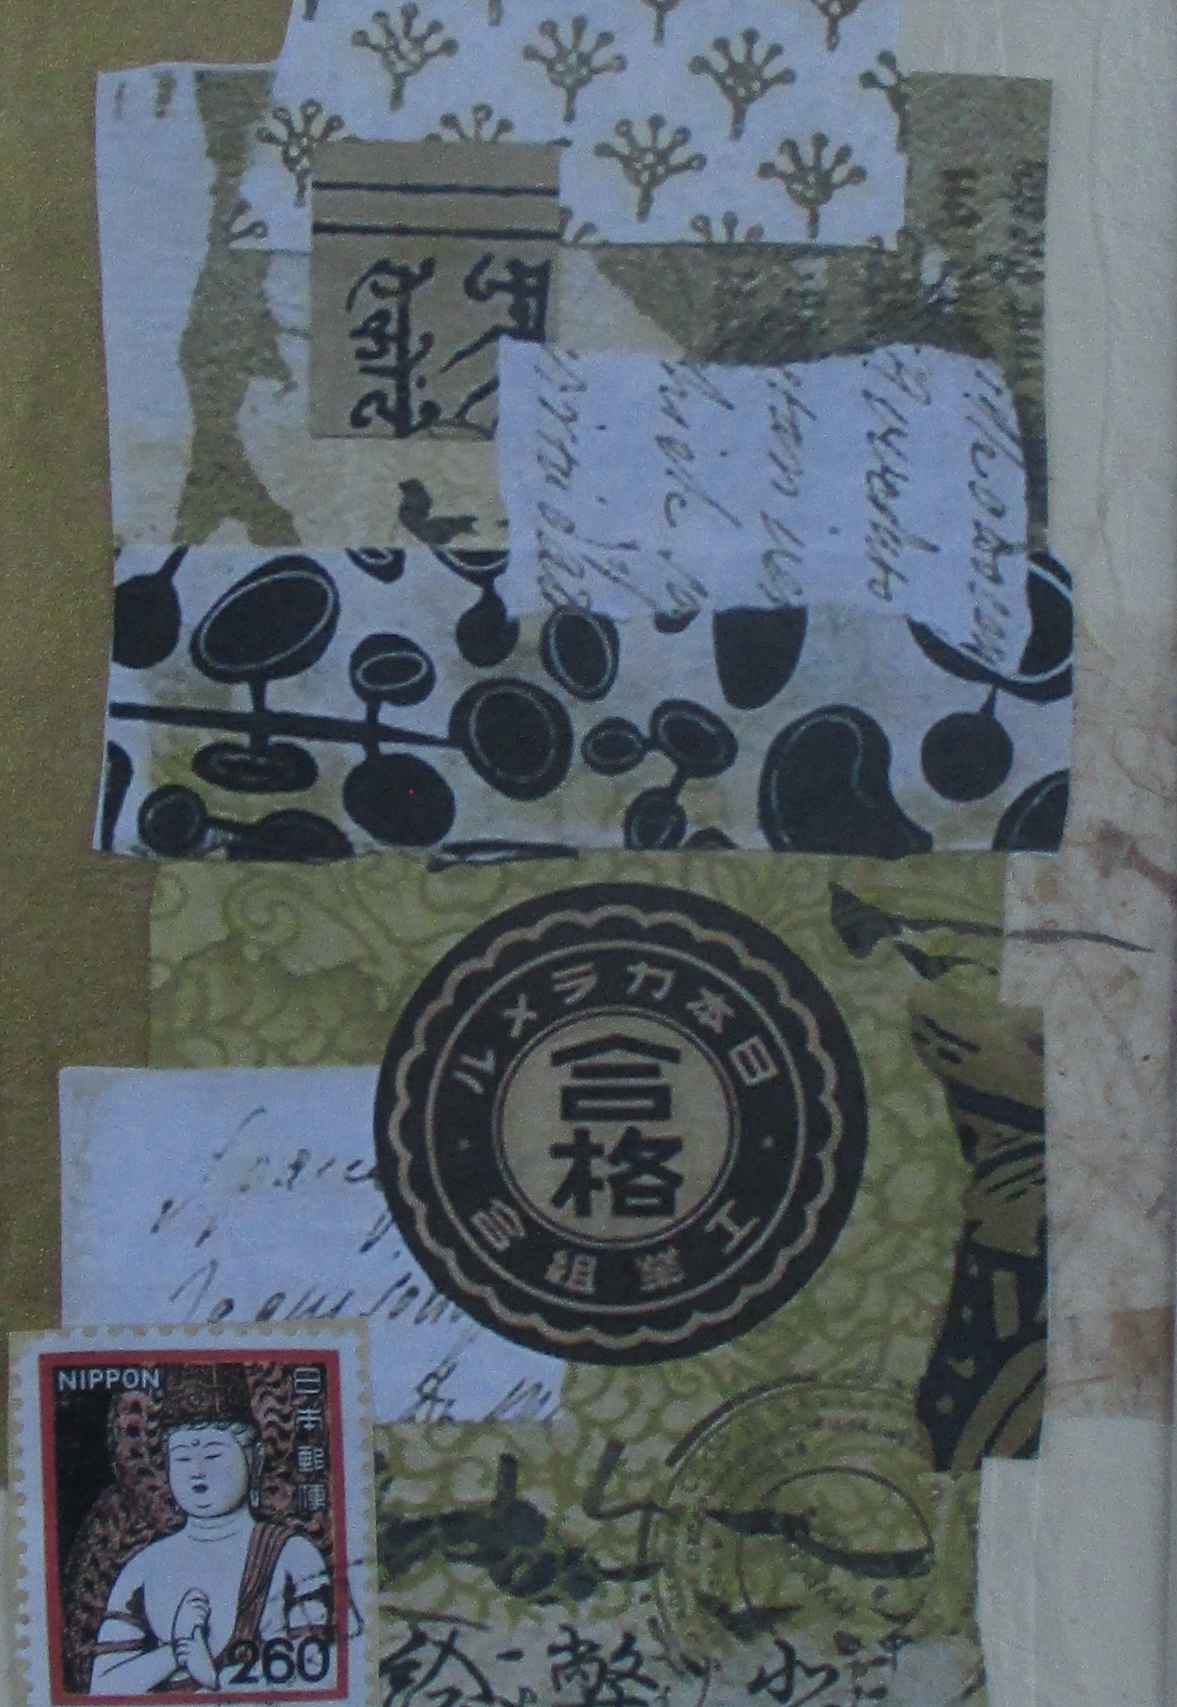 Gold Medallion ゴールドメダリオン Gōrudomedarion Collage, 11 x 14, matted, 2018